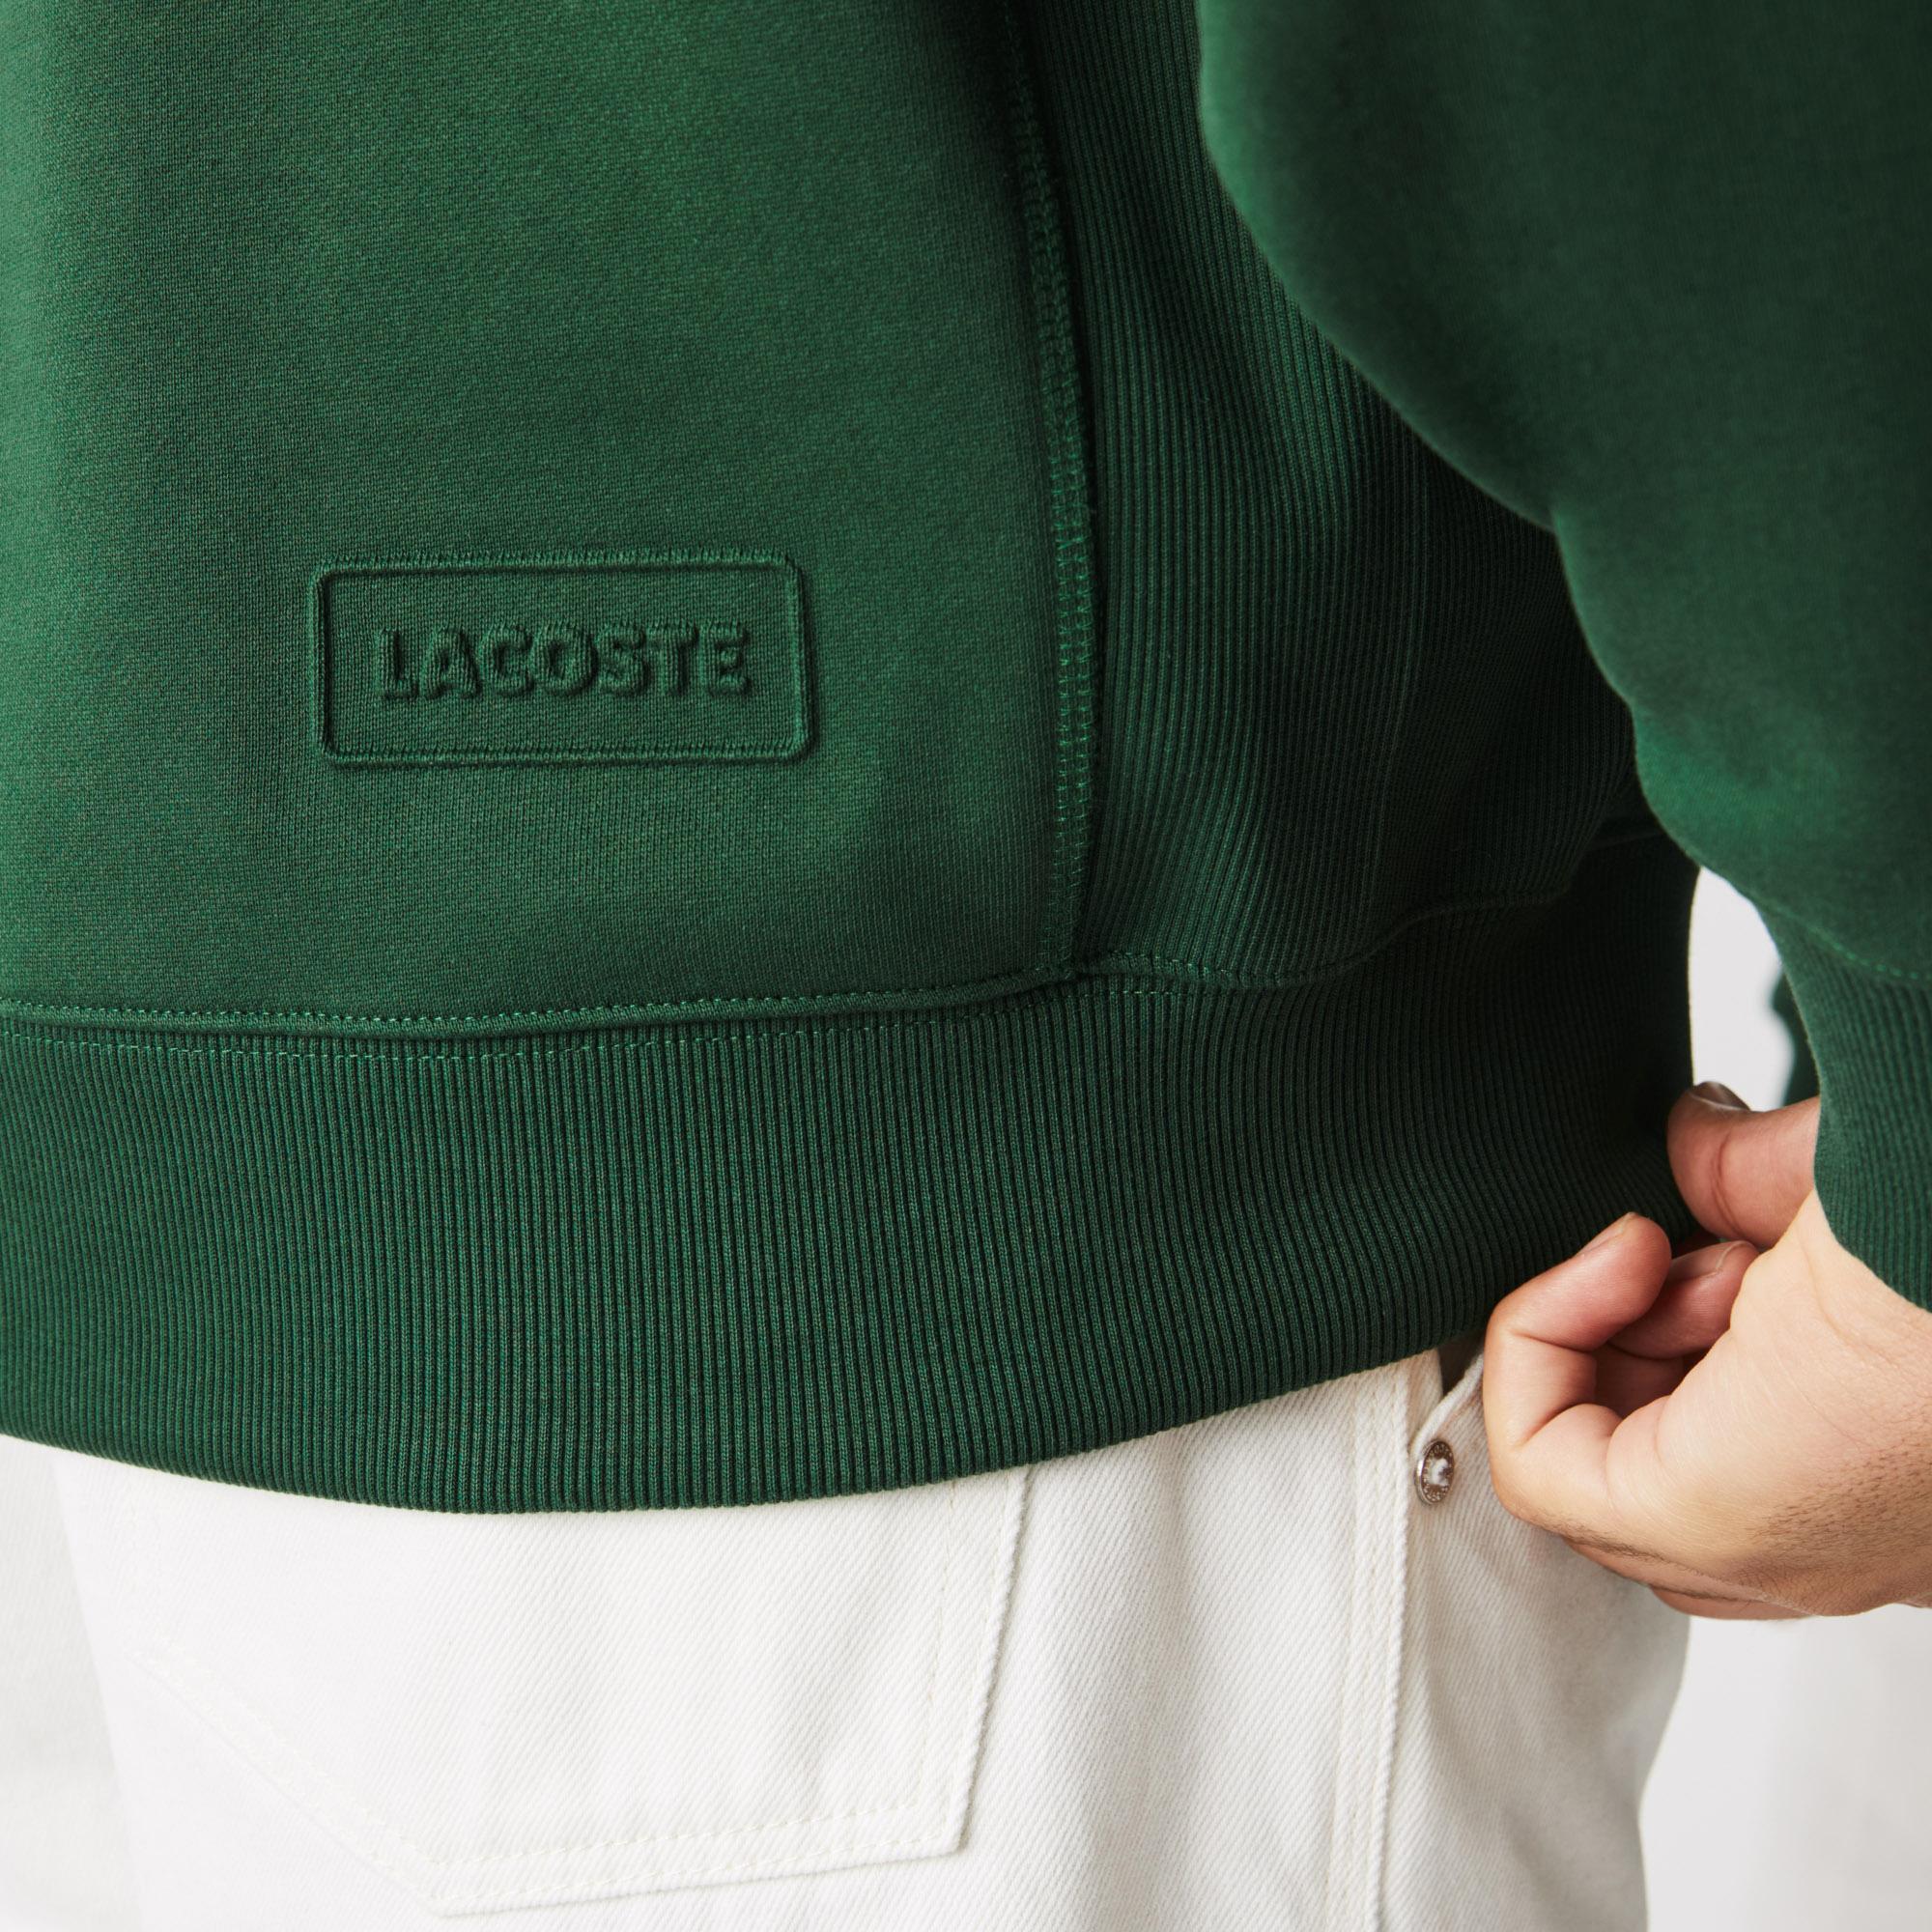 Lacoste L!ve Unisex Loose Fit Bisiklet Yaka Yeşil Sweatshirt